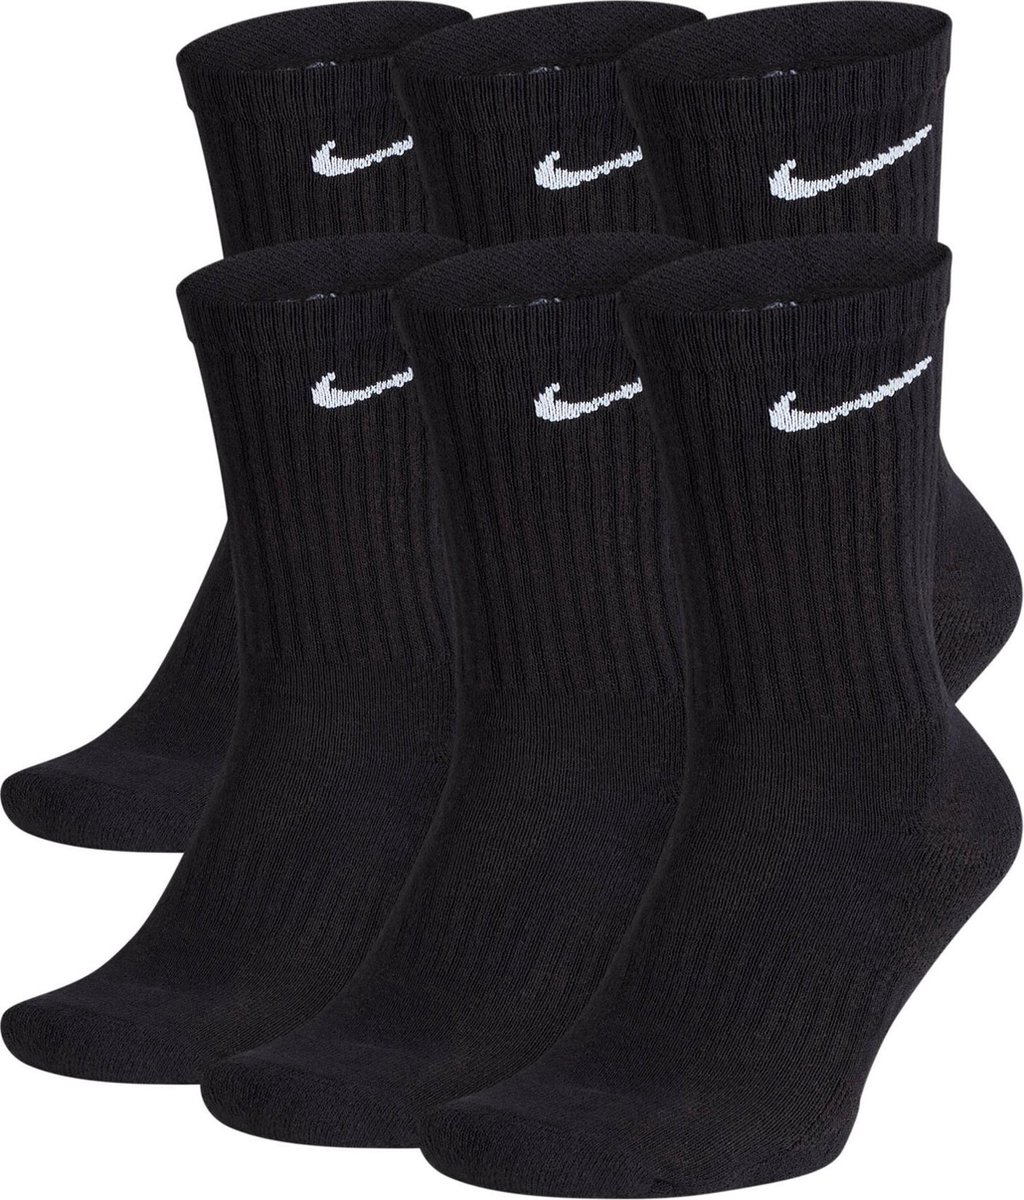 Nike Everyday Cushion Crew Sportsokken Unisex - Maat 42-46